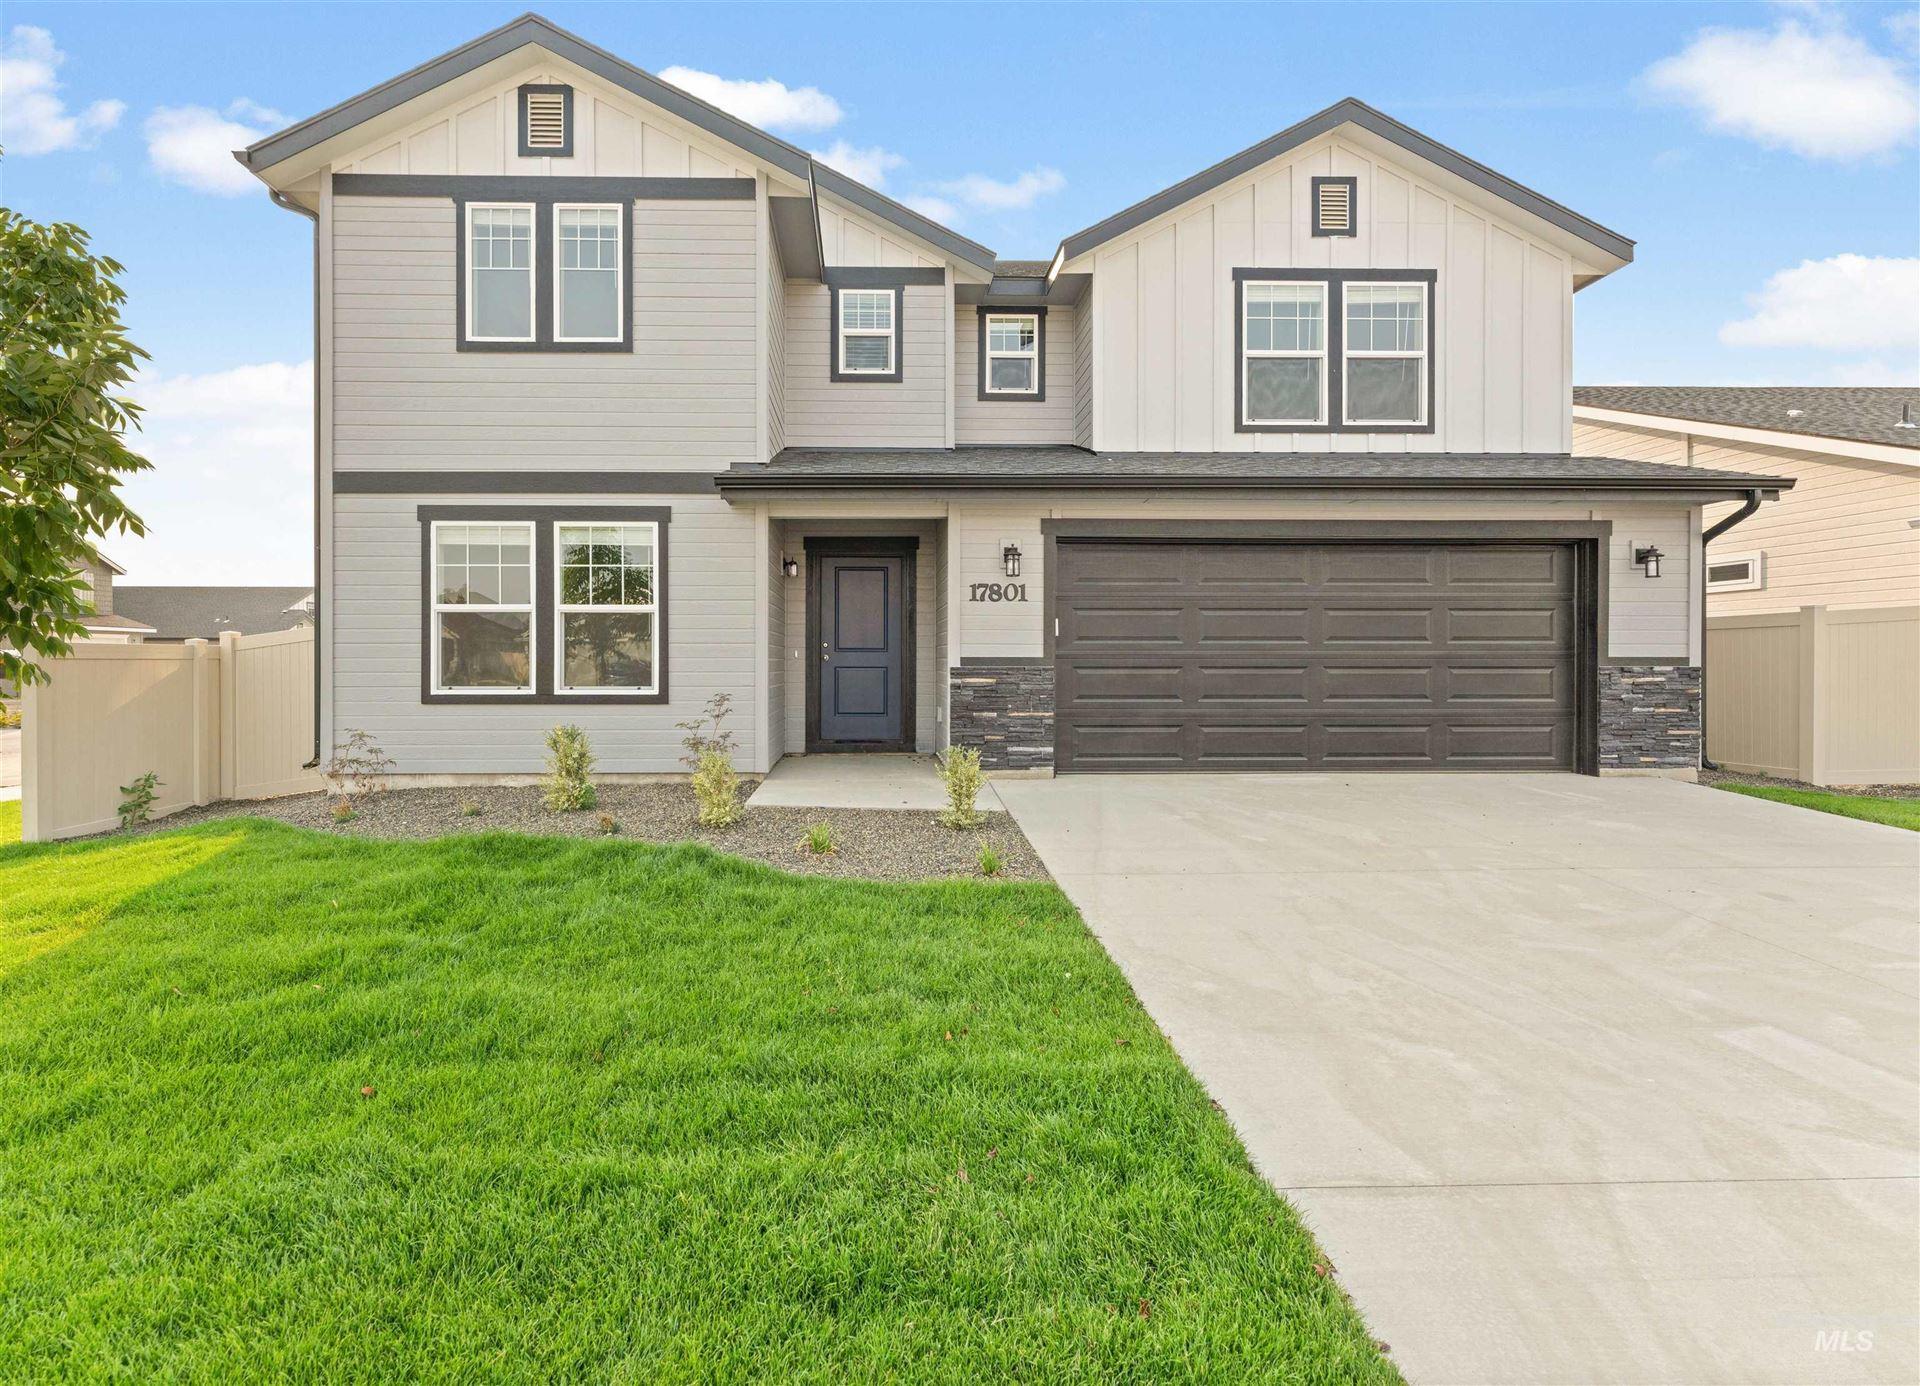 17801 Goose Ridge Ave, Nampa, ID 83687 - MLS#: 98817339